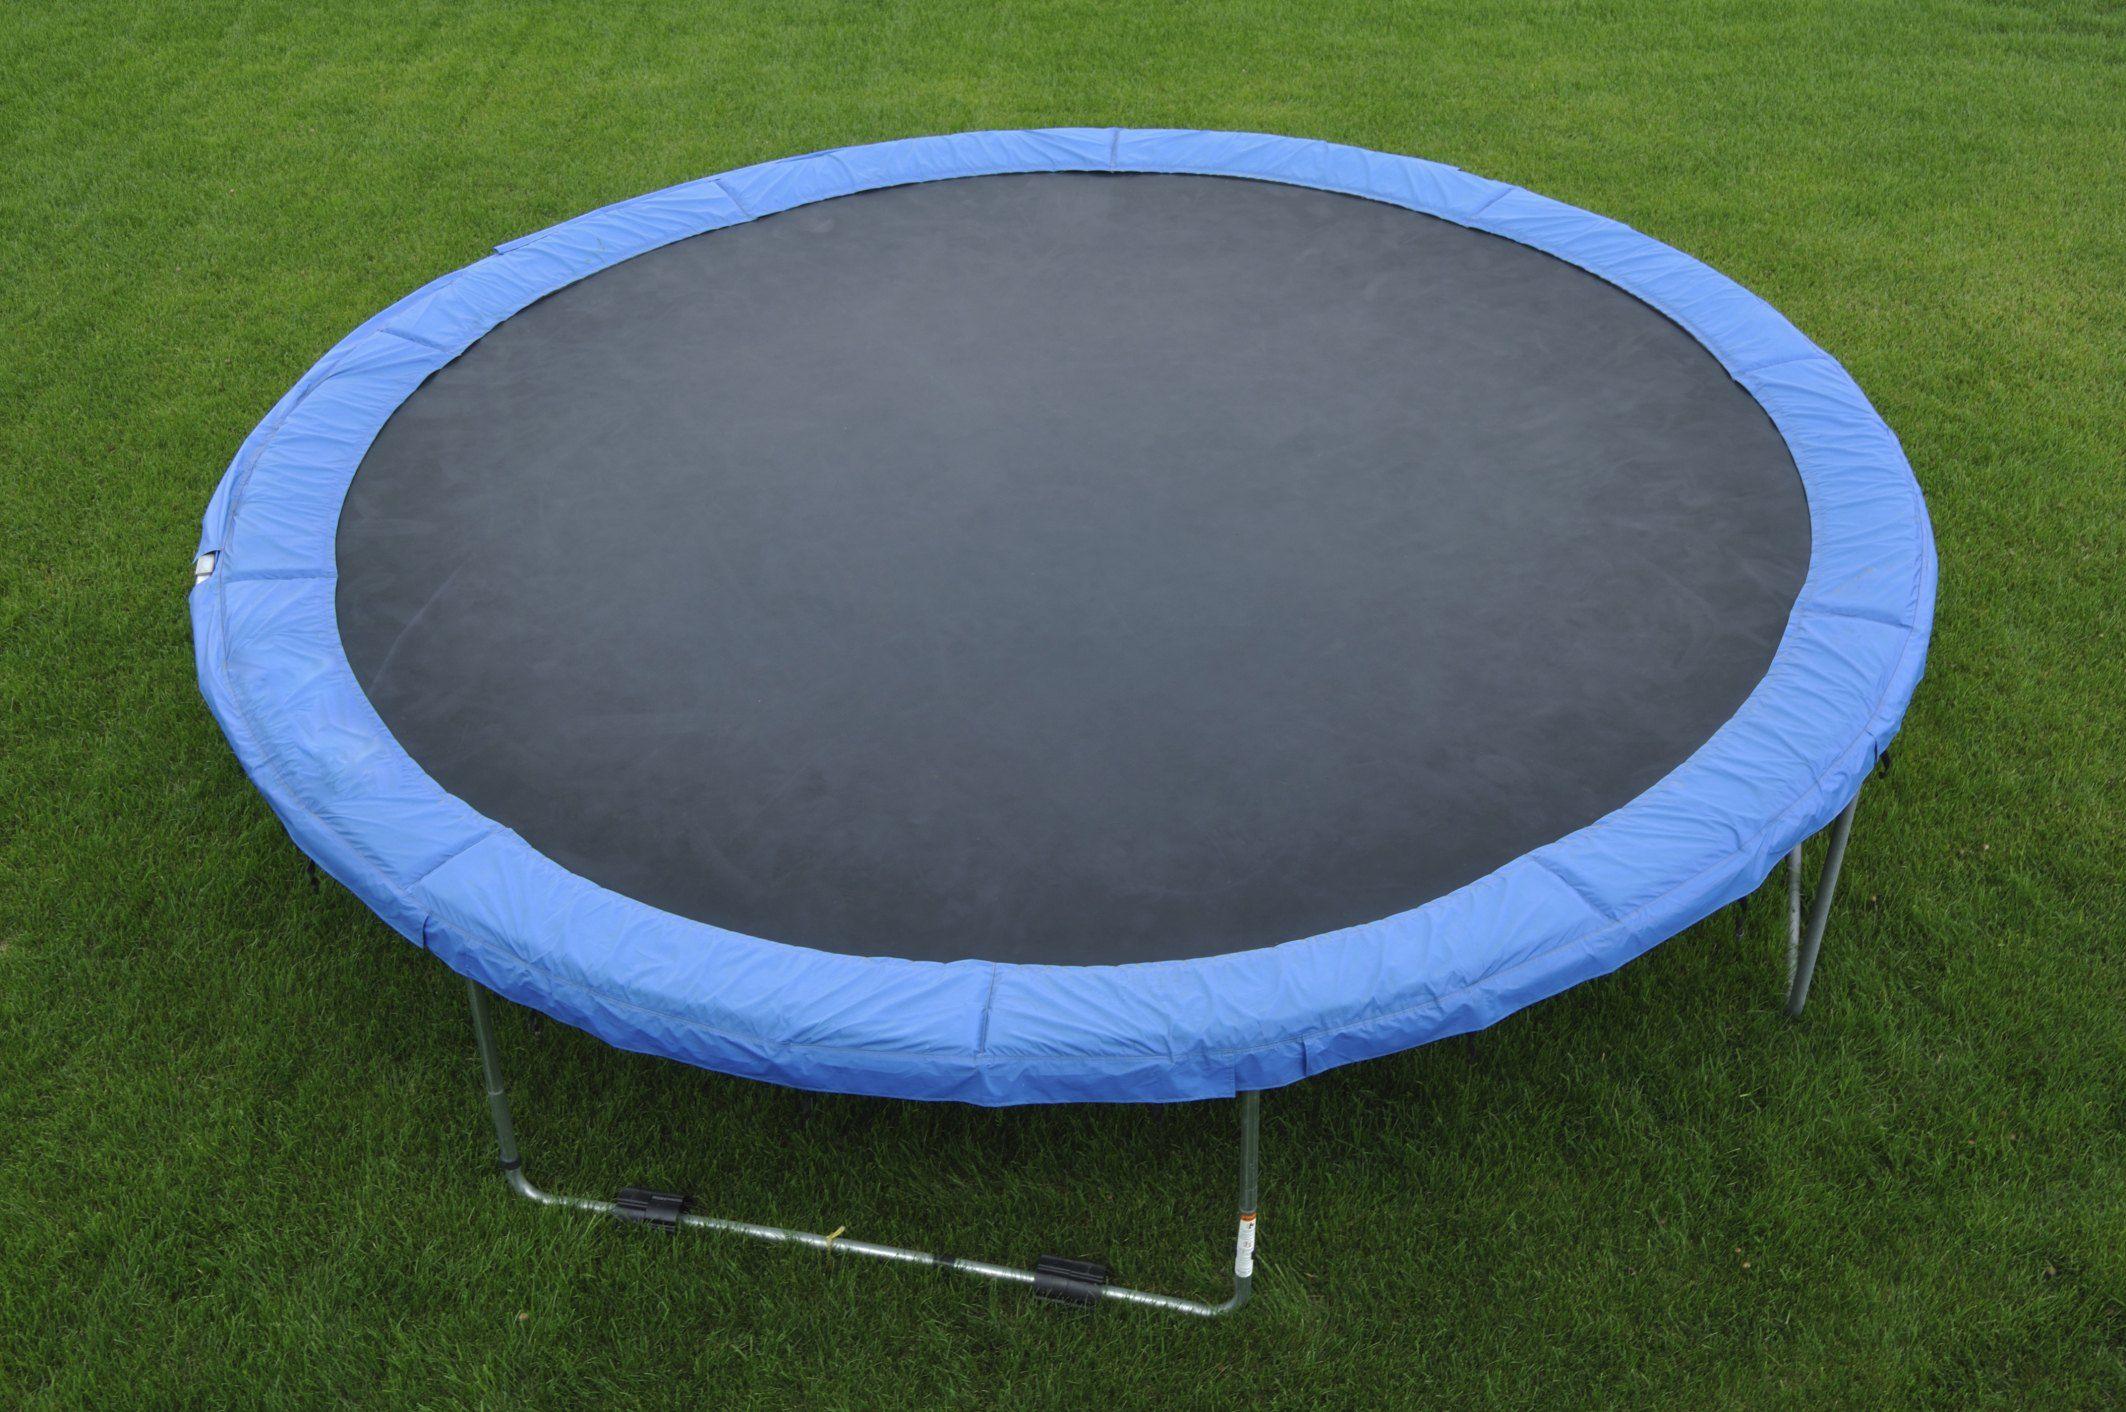 Exercise equipment best trampoline